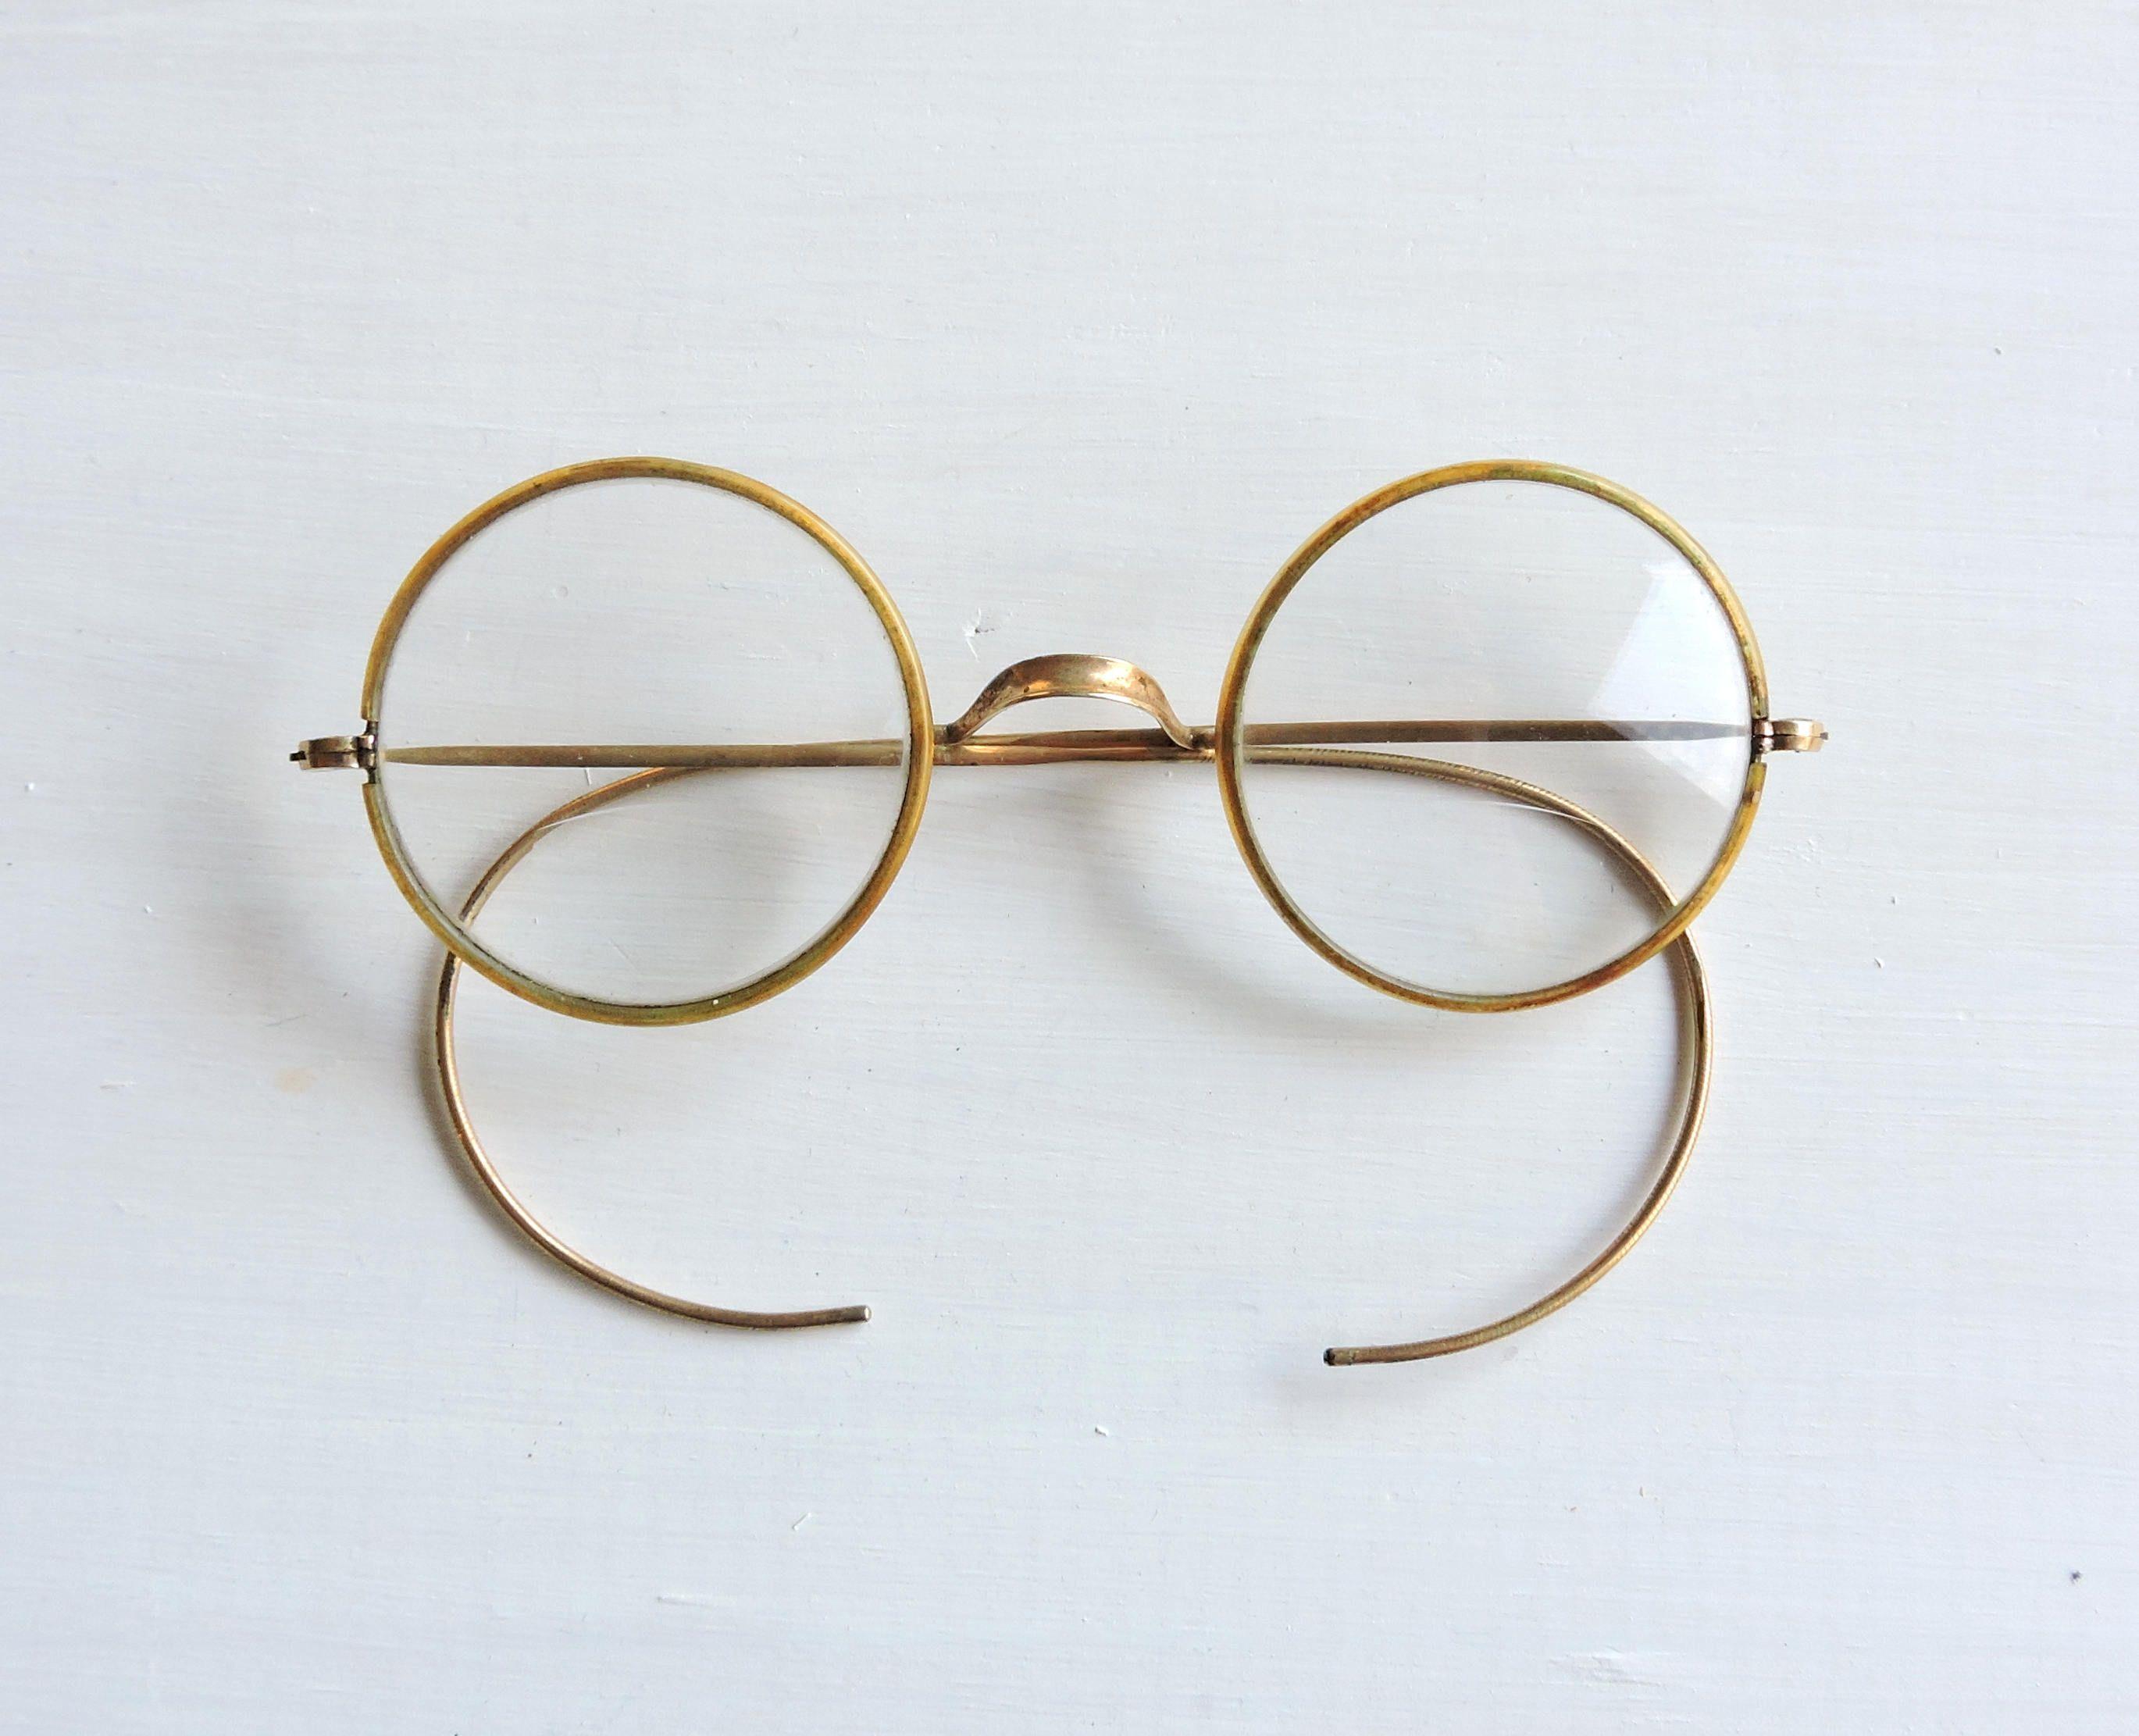 d27beacd5 Vintage Round Windsor Eyeglasses, Gold Antique Bifocals, Marked Windsor Eye  Glasses, Celluloid Eyerims, Saddle Bridge, Riding Bow Temples by ...